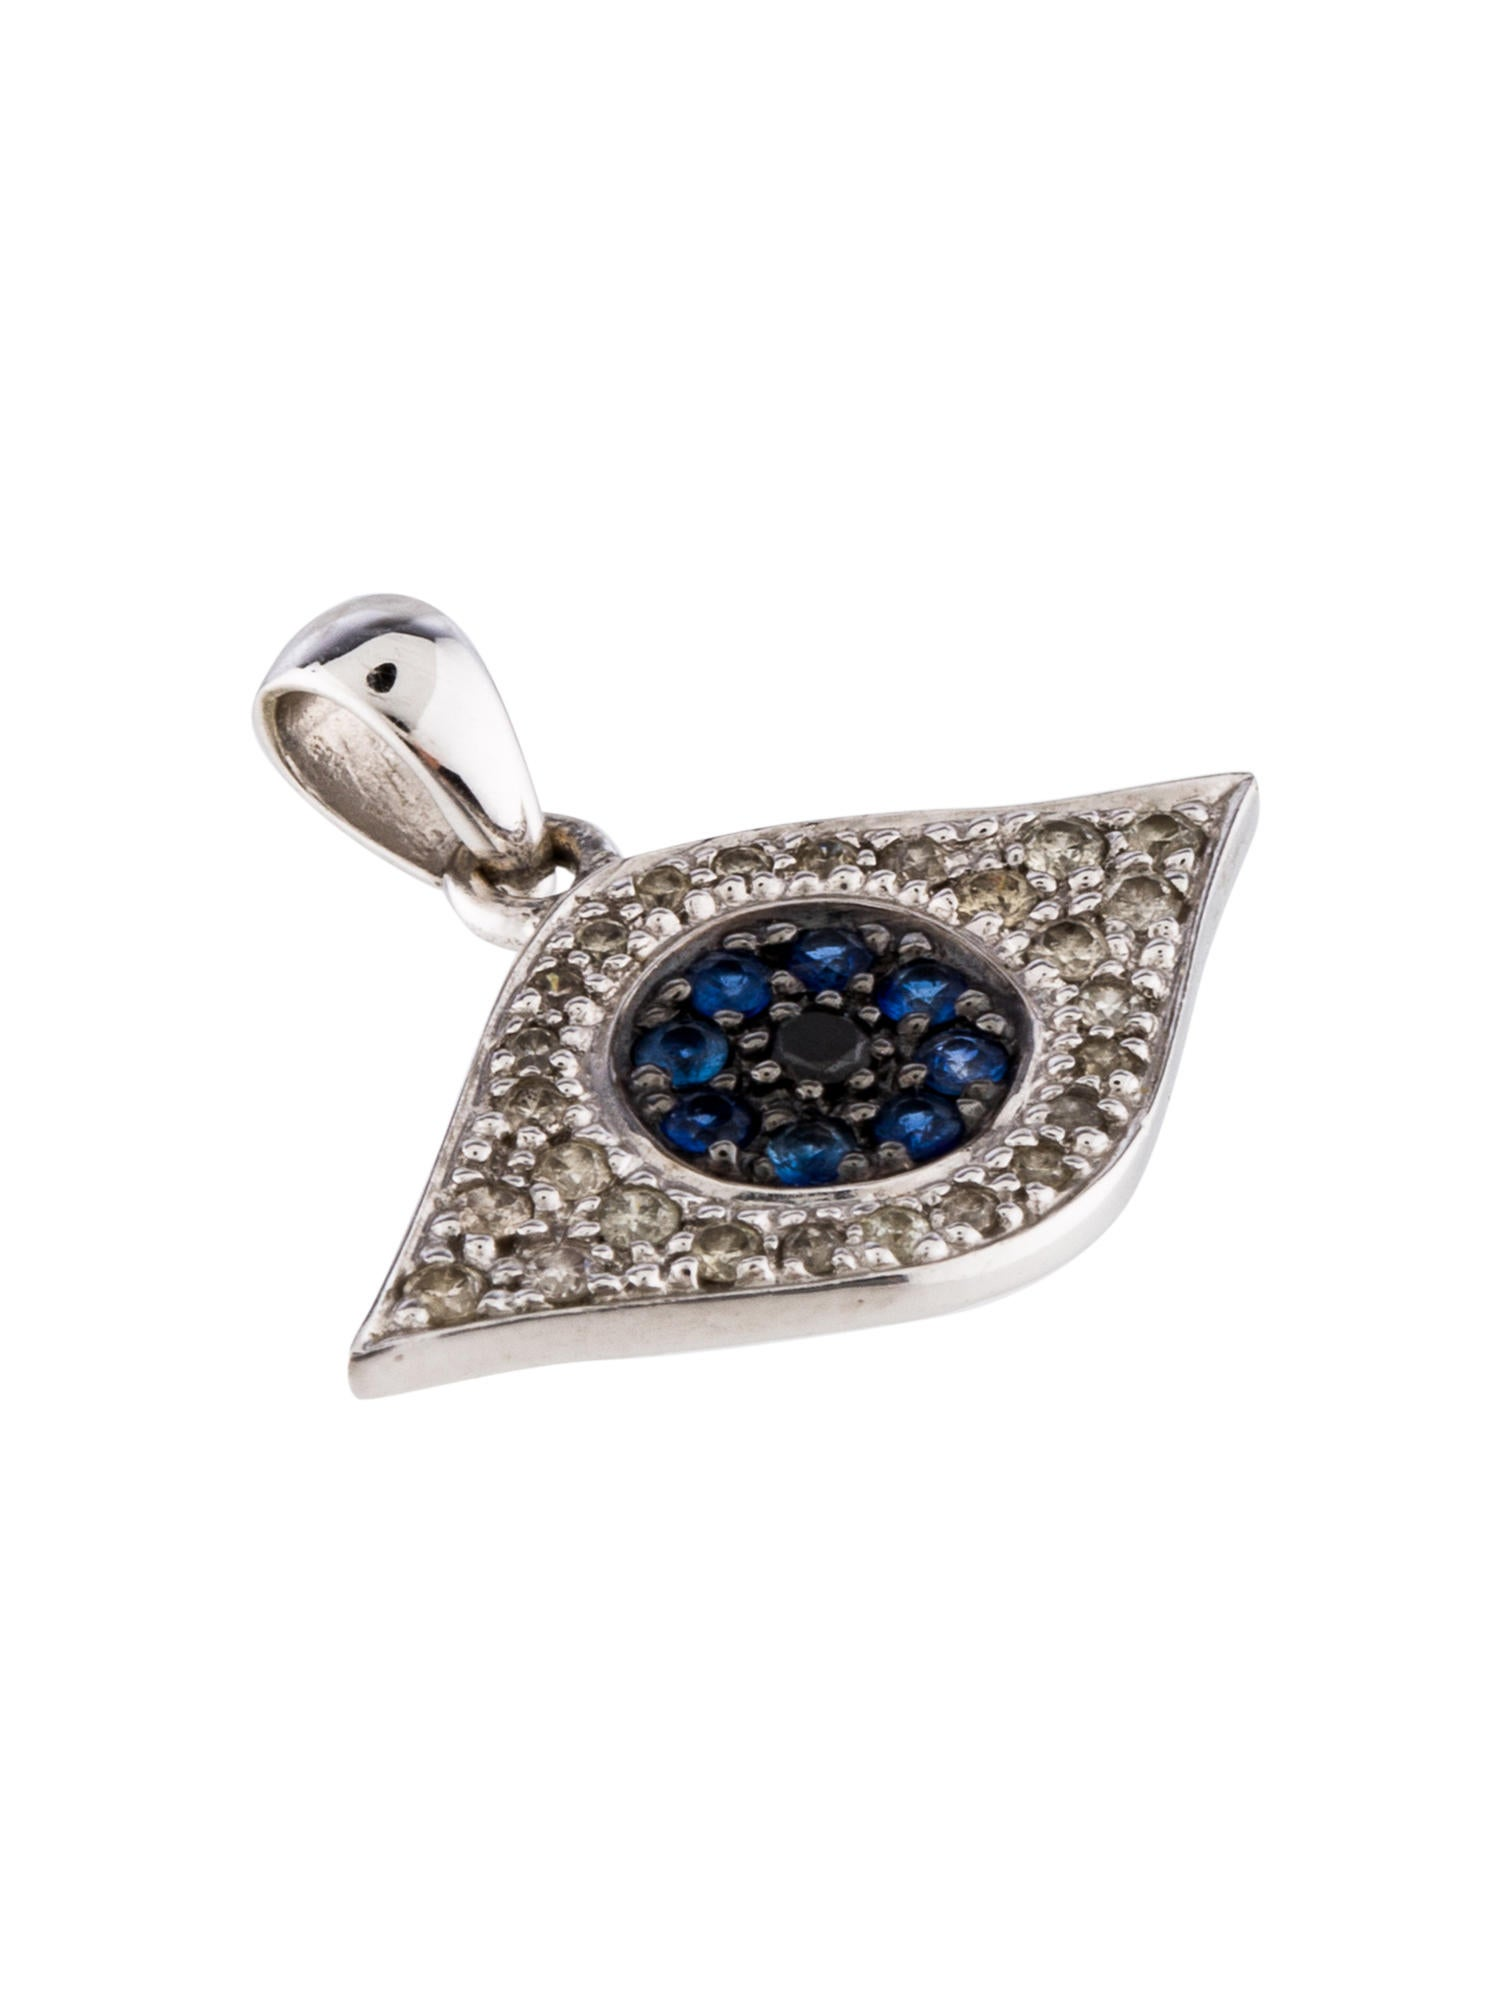 sydney evan 14k diamond sapphire evil eye pendant. Black Bedroom Furniture Sets. Home Design Ideas